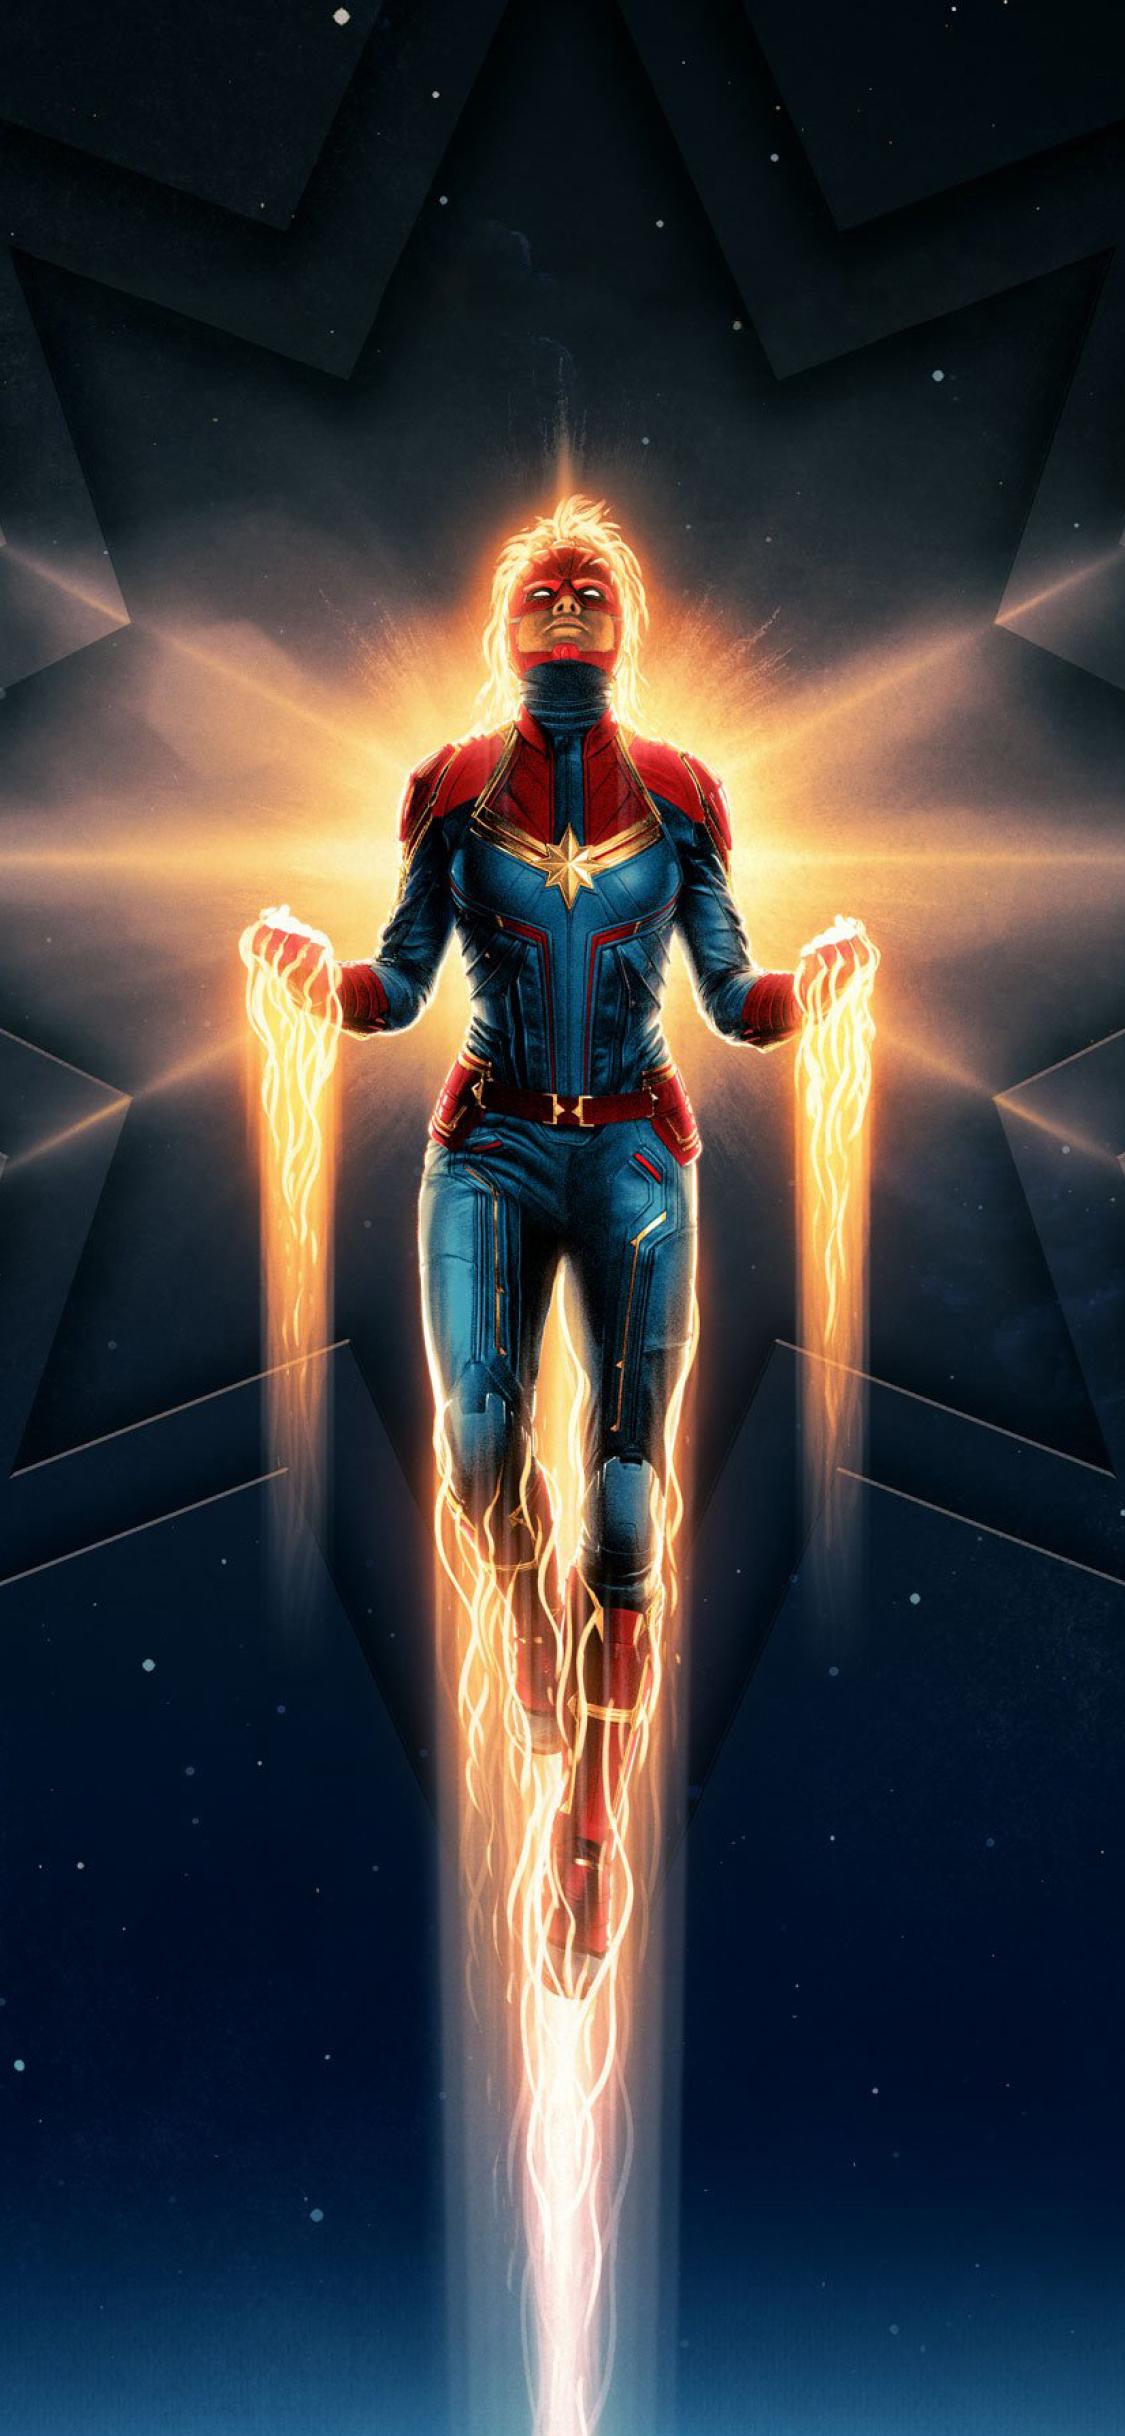 HD Wallpaper | Background Image Captain Marvel Movie 2019